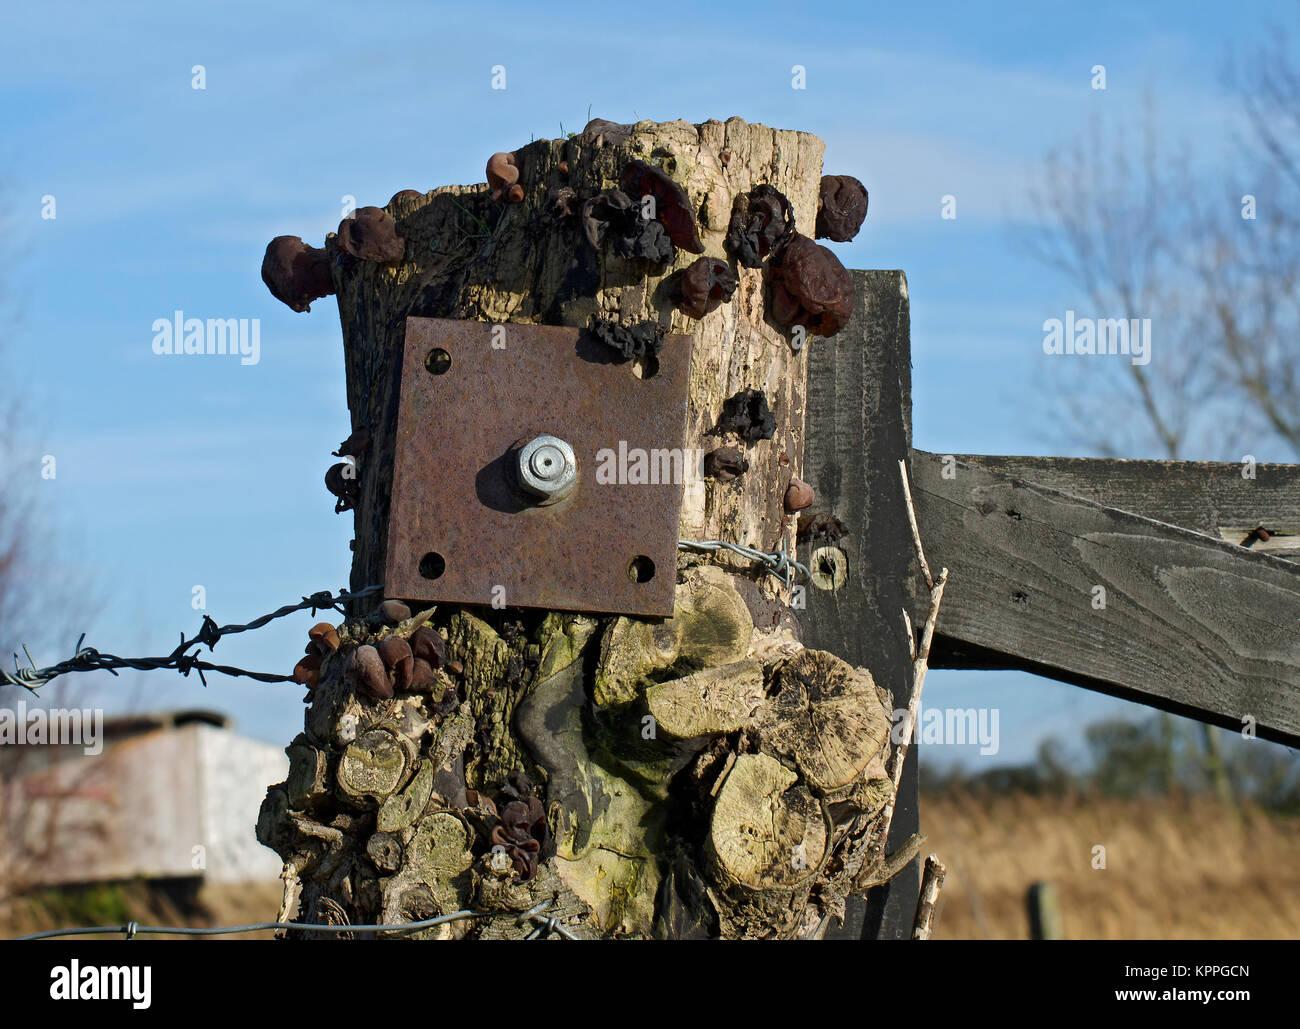 Black witches' butter, fungus, Exidia glandulosa, Exidia truncata, fruiting on old gatepost, Lancashire, UK - Stock Image